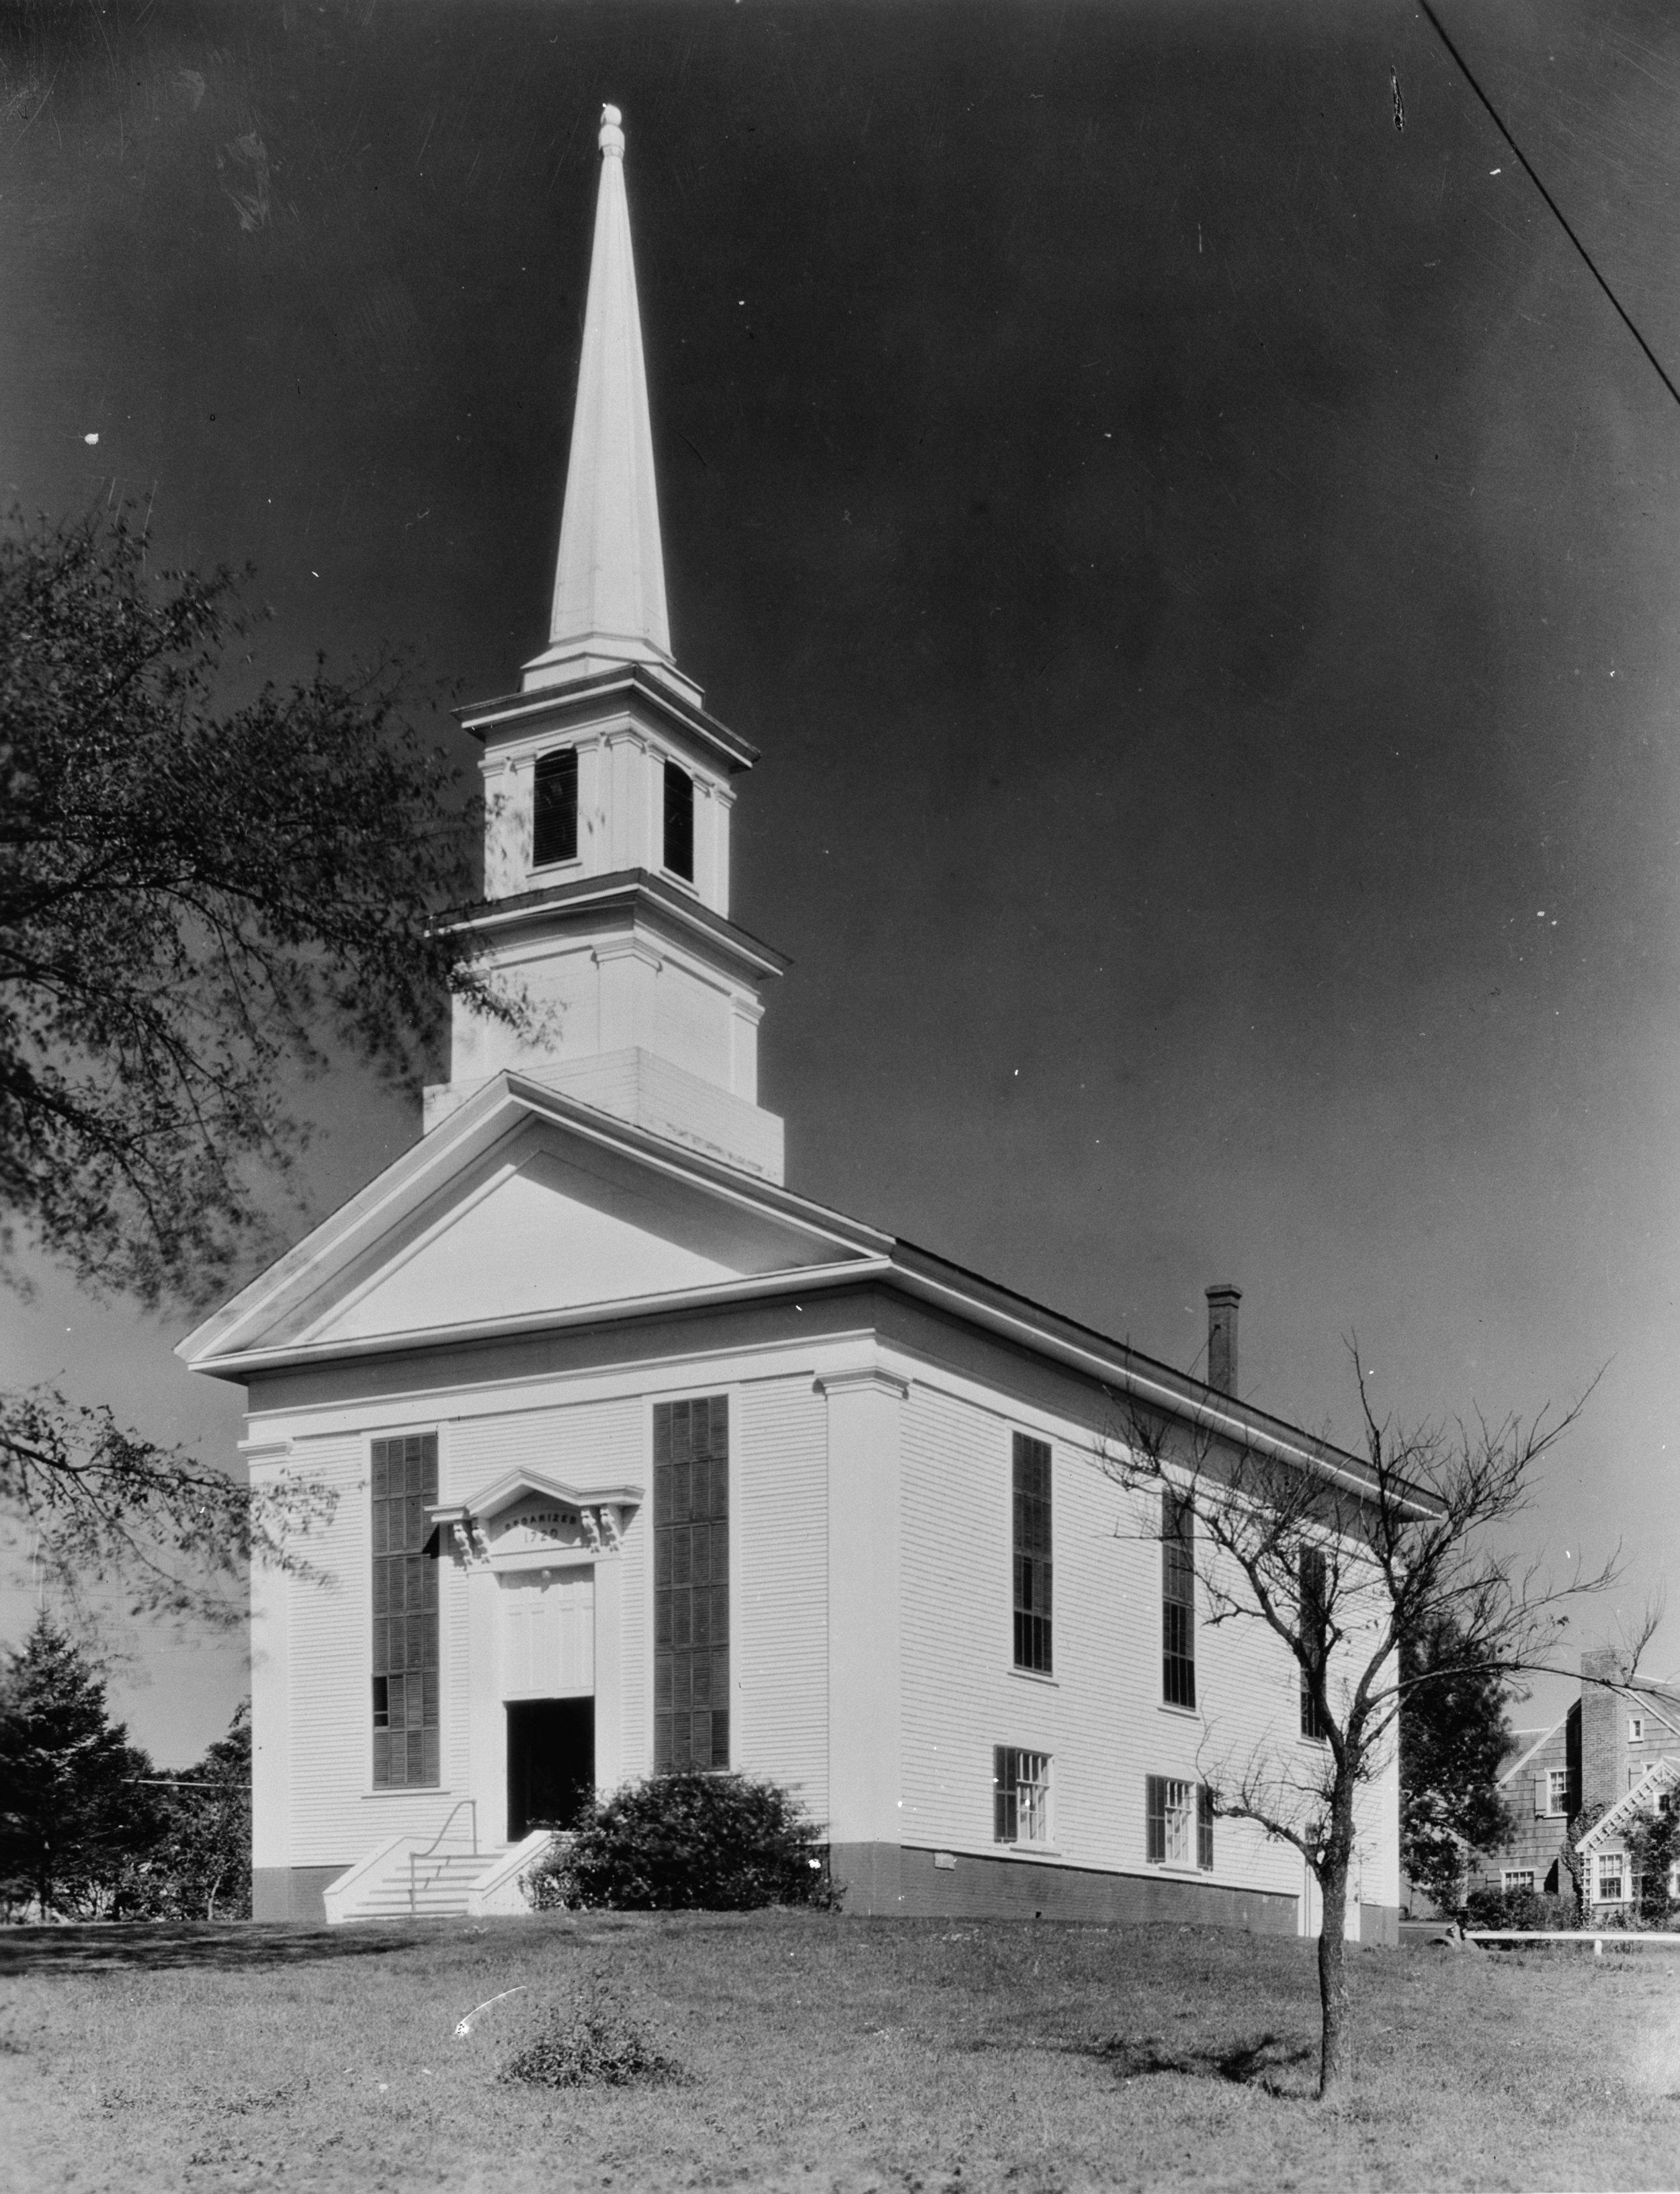 1936 Historic American Buildings Survey Image